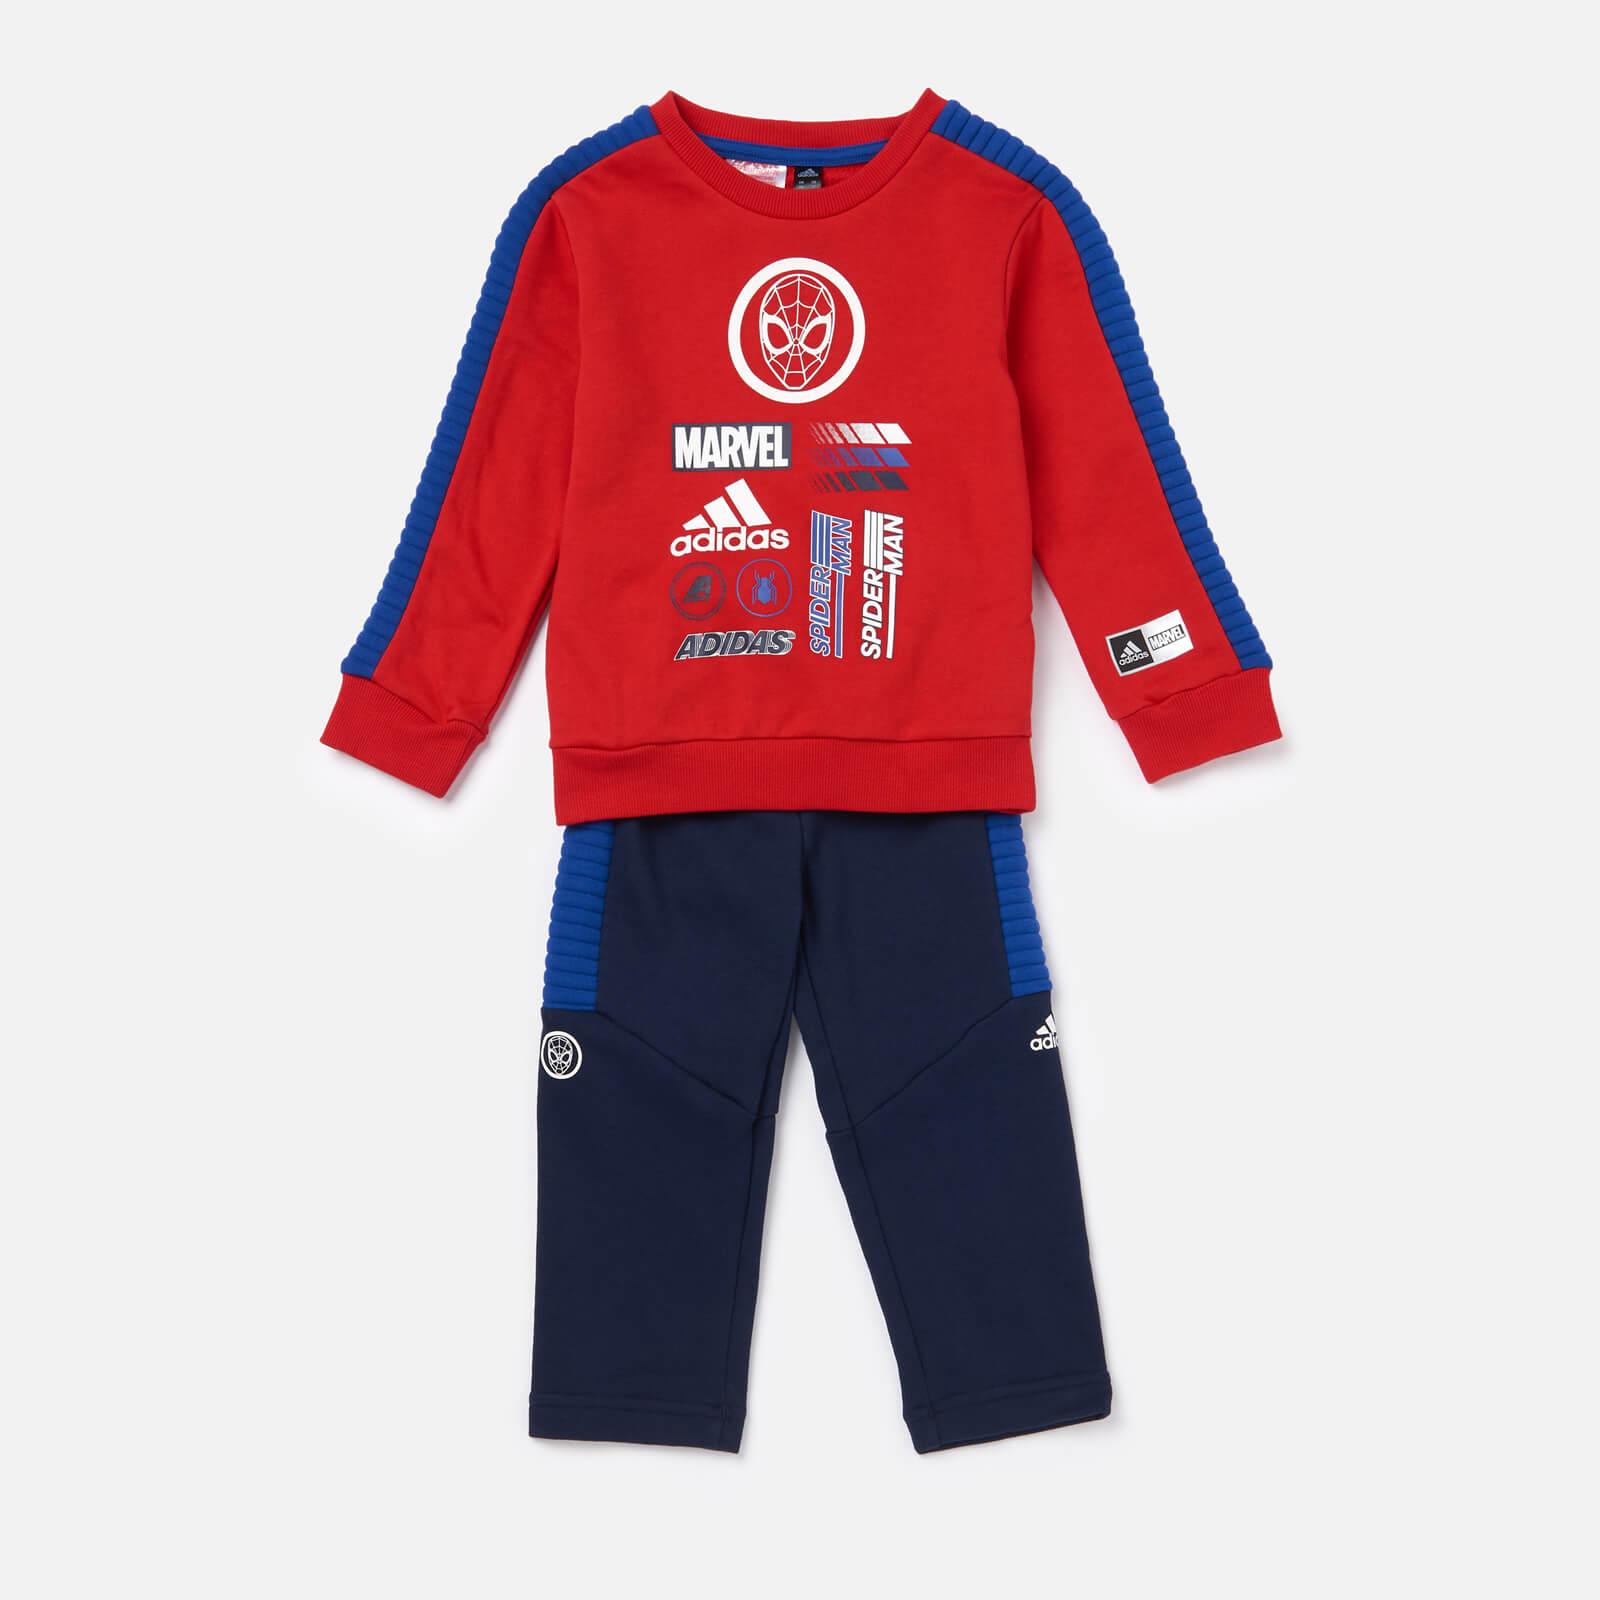 adidas Boys' Infant Spider-Man Jogger Set - Red/Blue - 0-3 months